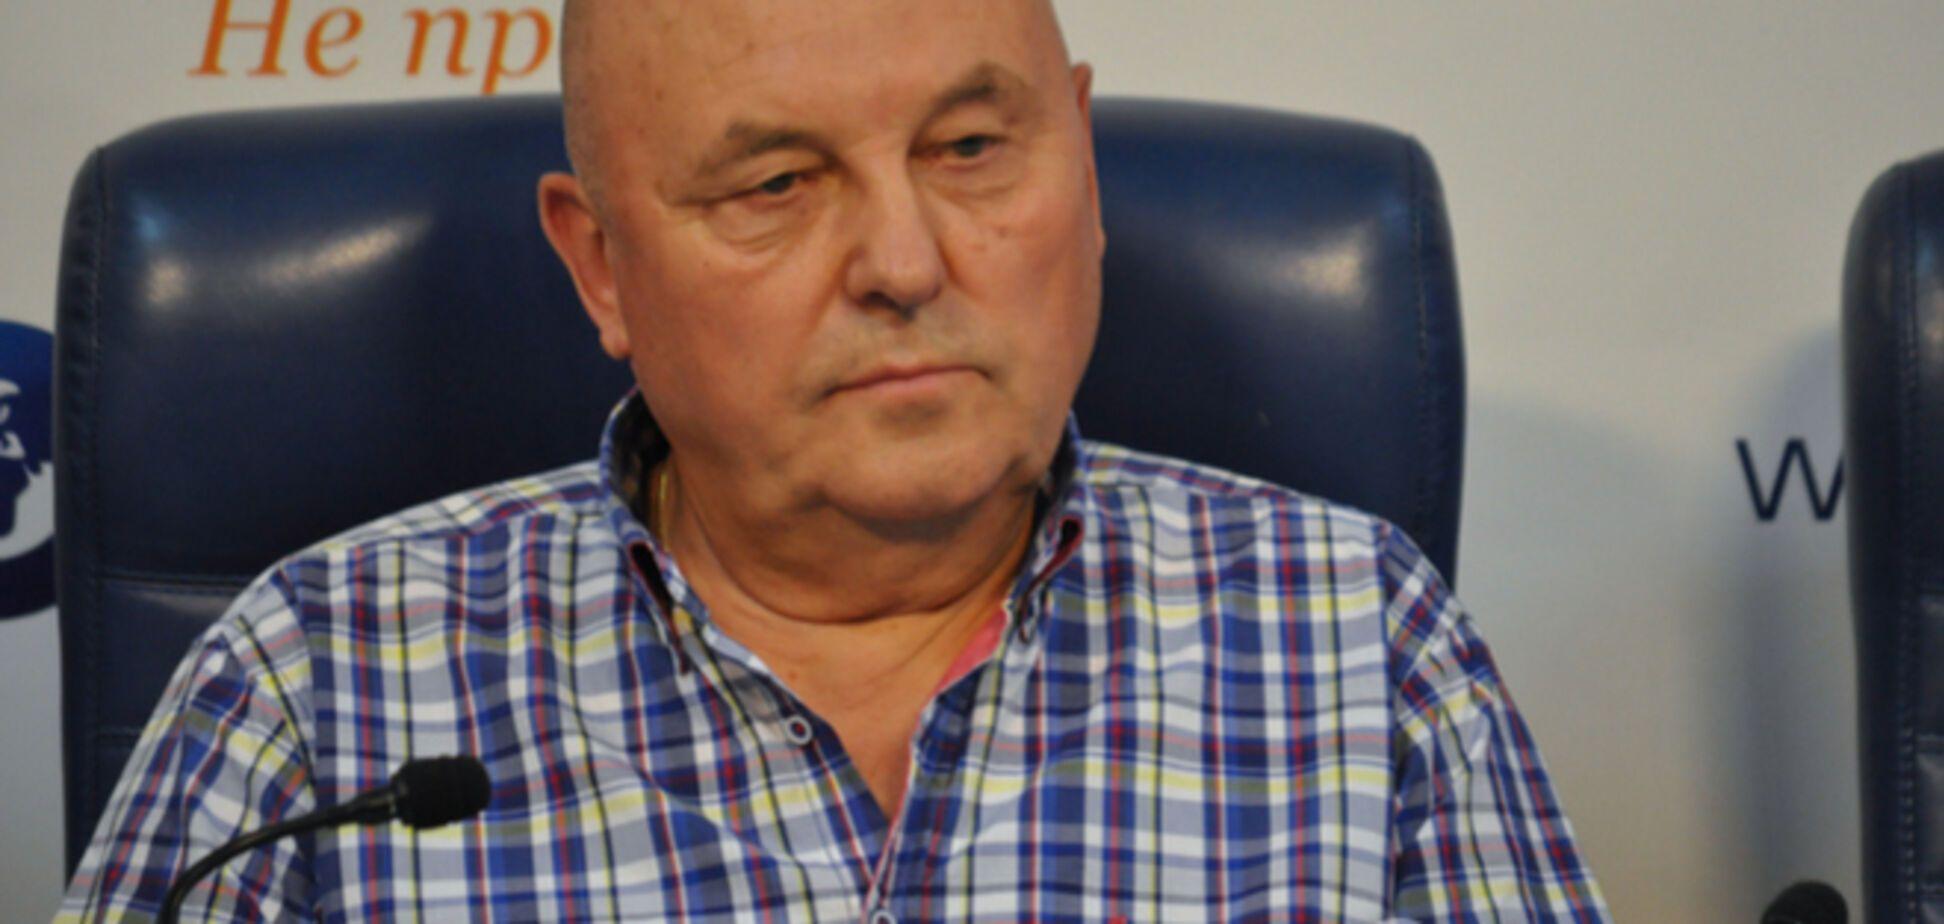 Генерал озвучил три версии активизации боевиков на Донбассе